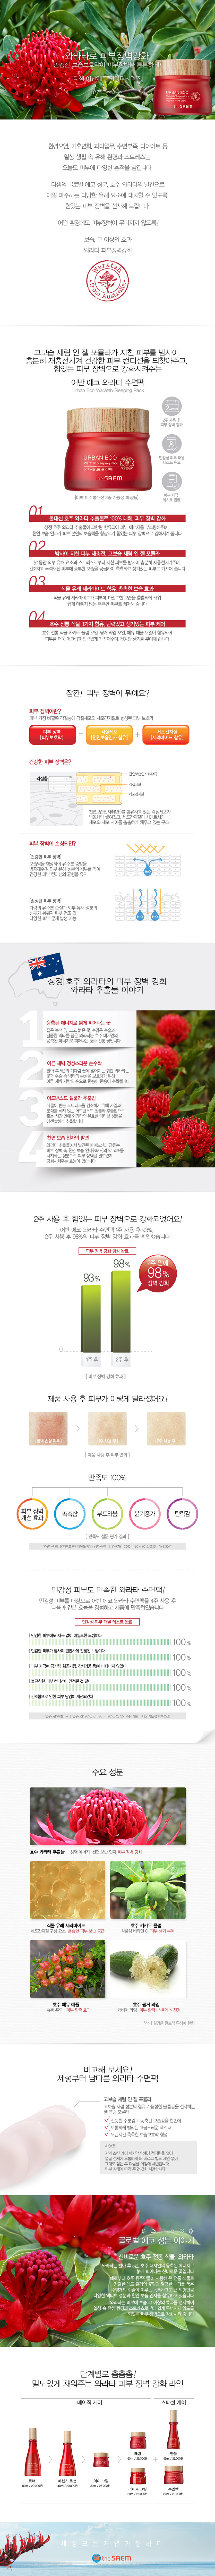 %EC%96%B4%EB%B0%98%20%EC%97%90%EC%BD%94%20%EC%99%80%EB%9D%BC%ED%83%80%20%EC%88%98%EB%A9%B4%ED%8C%A9.jpg